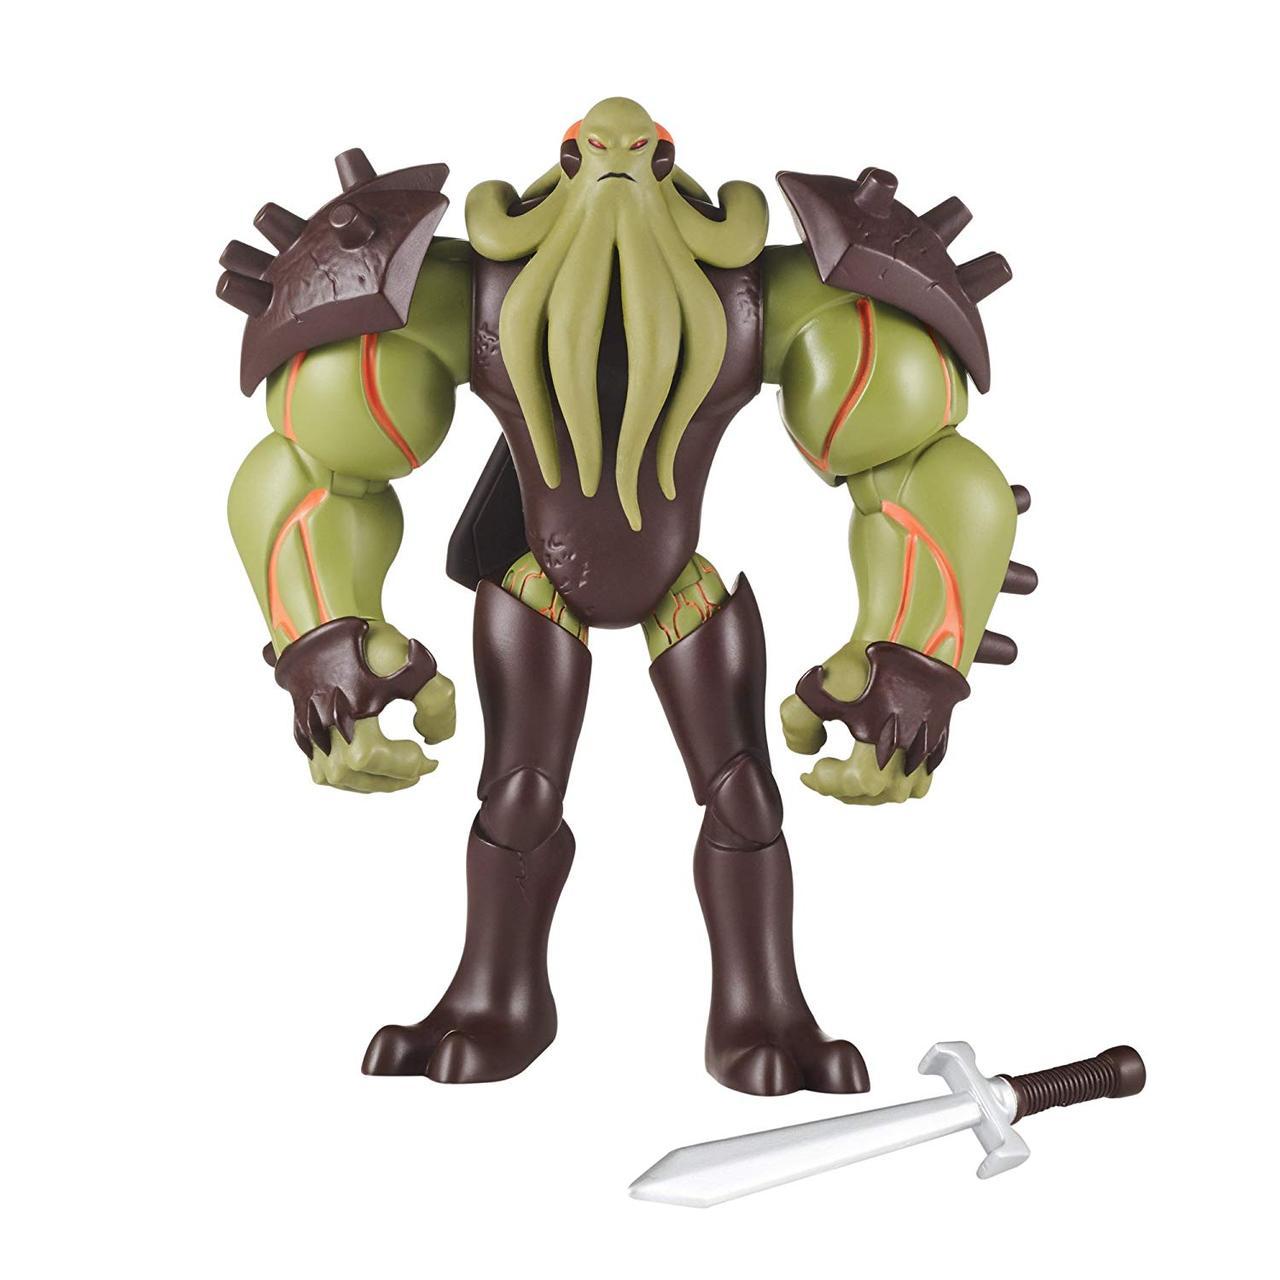 Бен Тен 10 Перезагрузка - Вилгакс, Ben 10: Vilgax with Battle Sword Action Figure, оригинал из США